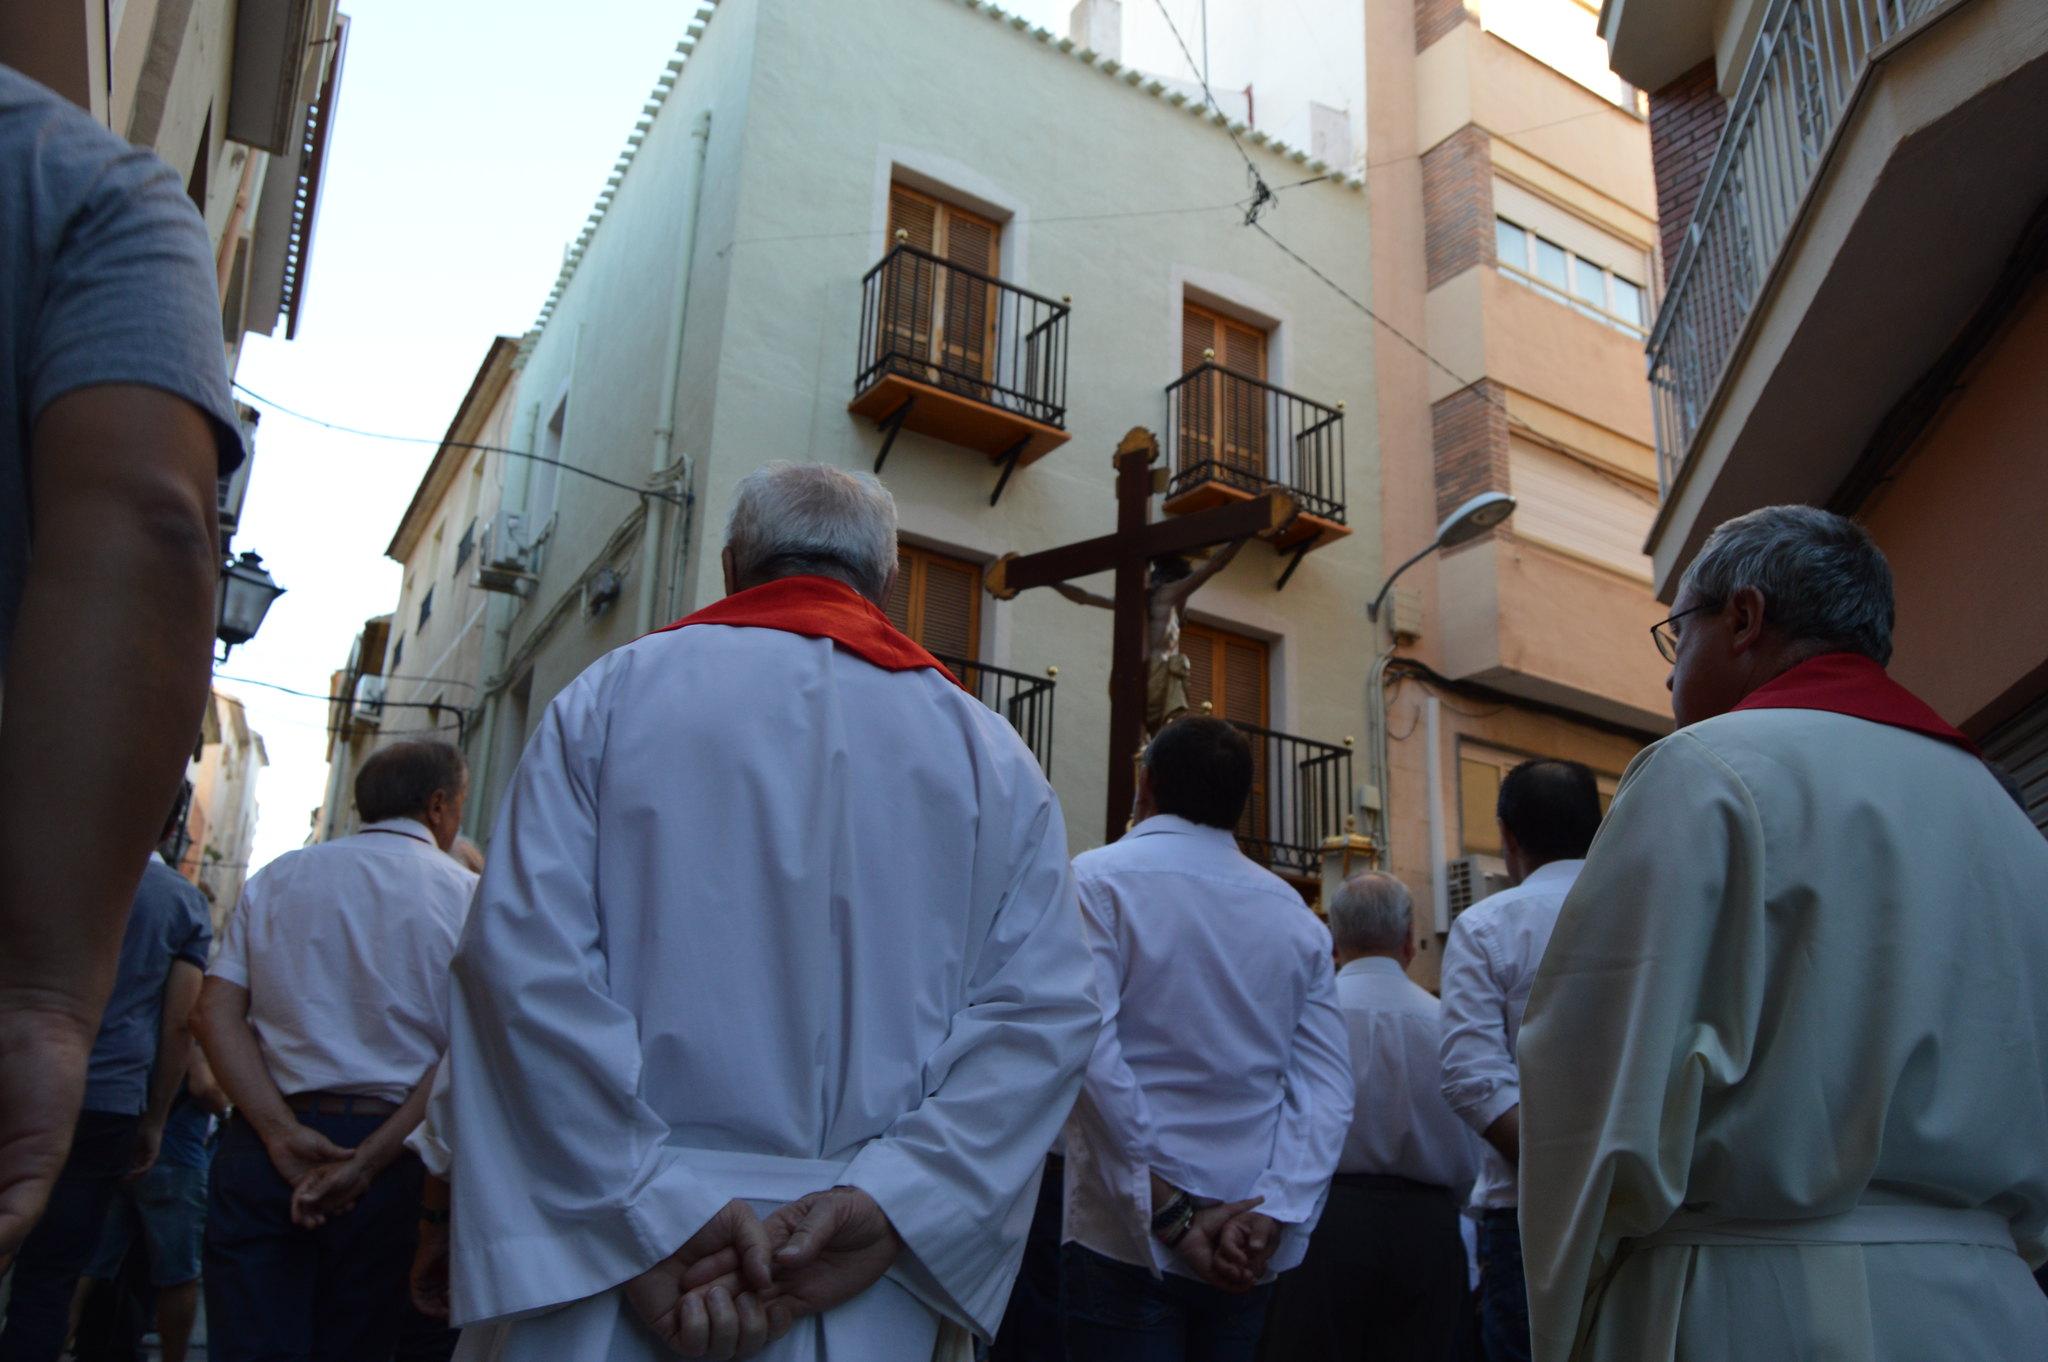 (2017-07-02) Procesión de subida (Adrián Romero Montesinos) (24)